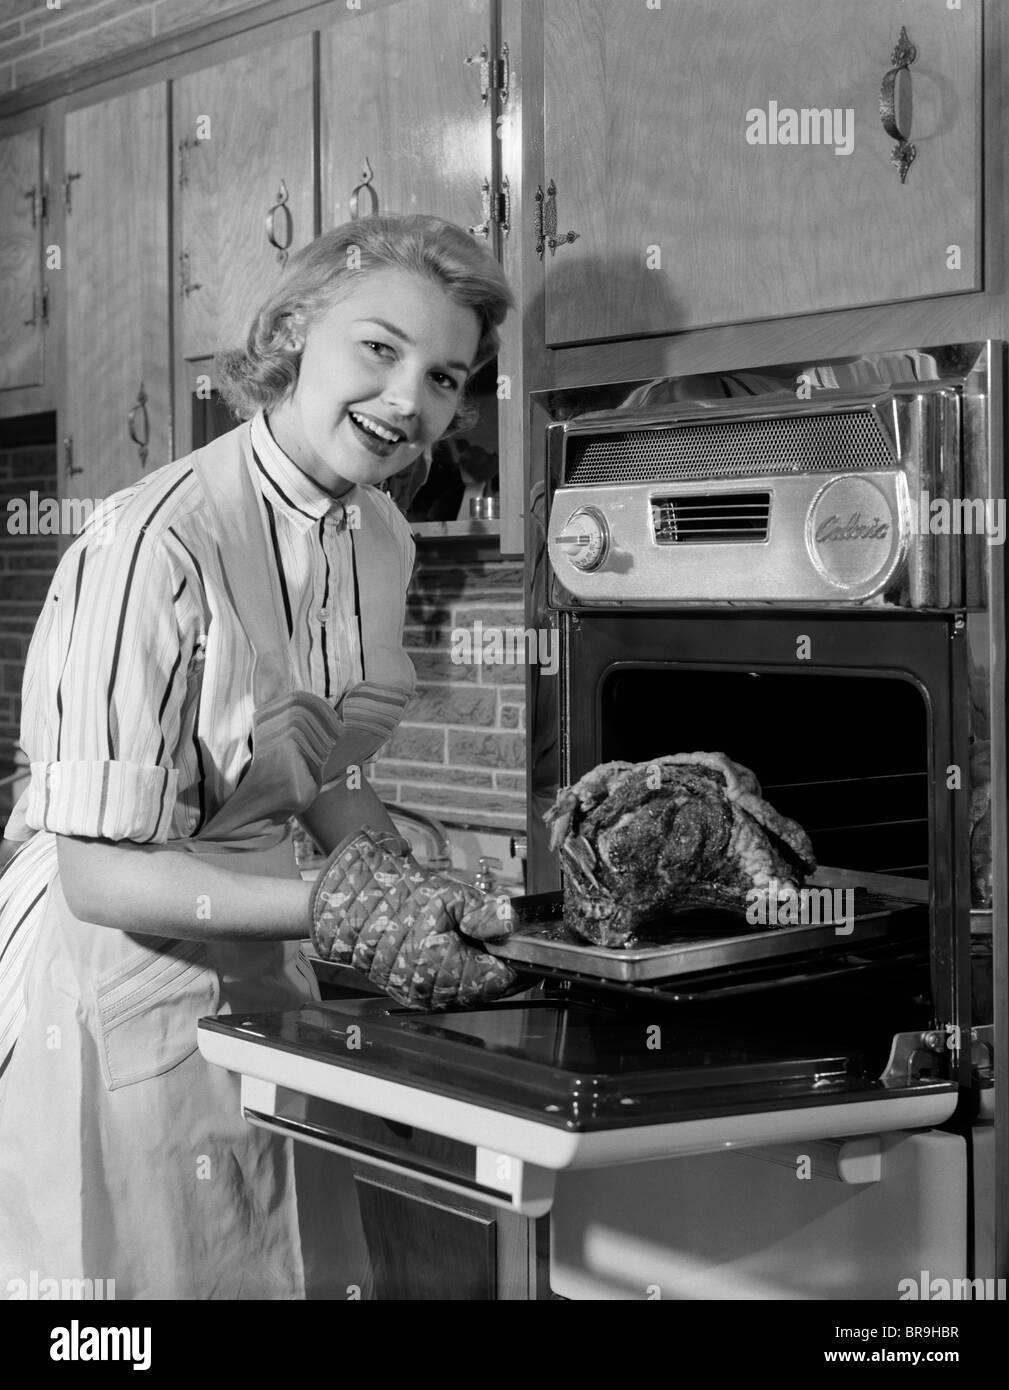 1950s SMILING WOMAN HOUSEWIFE WEARING APRON TAKING LARGE ...